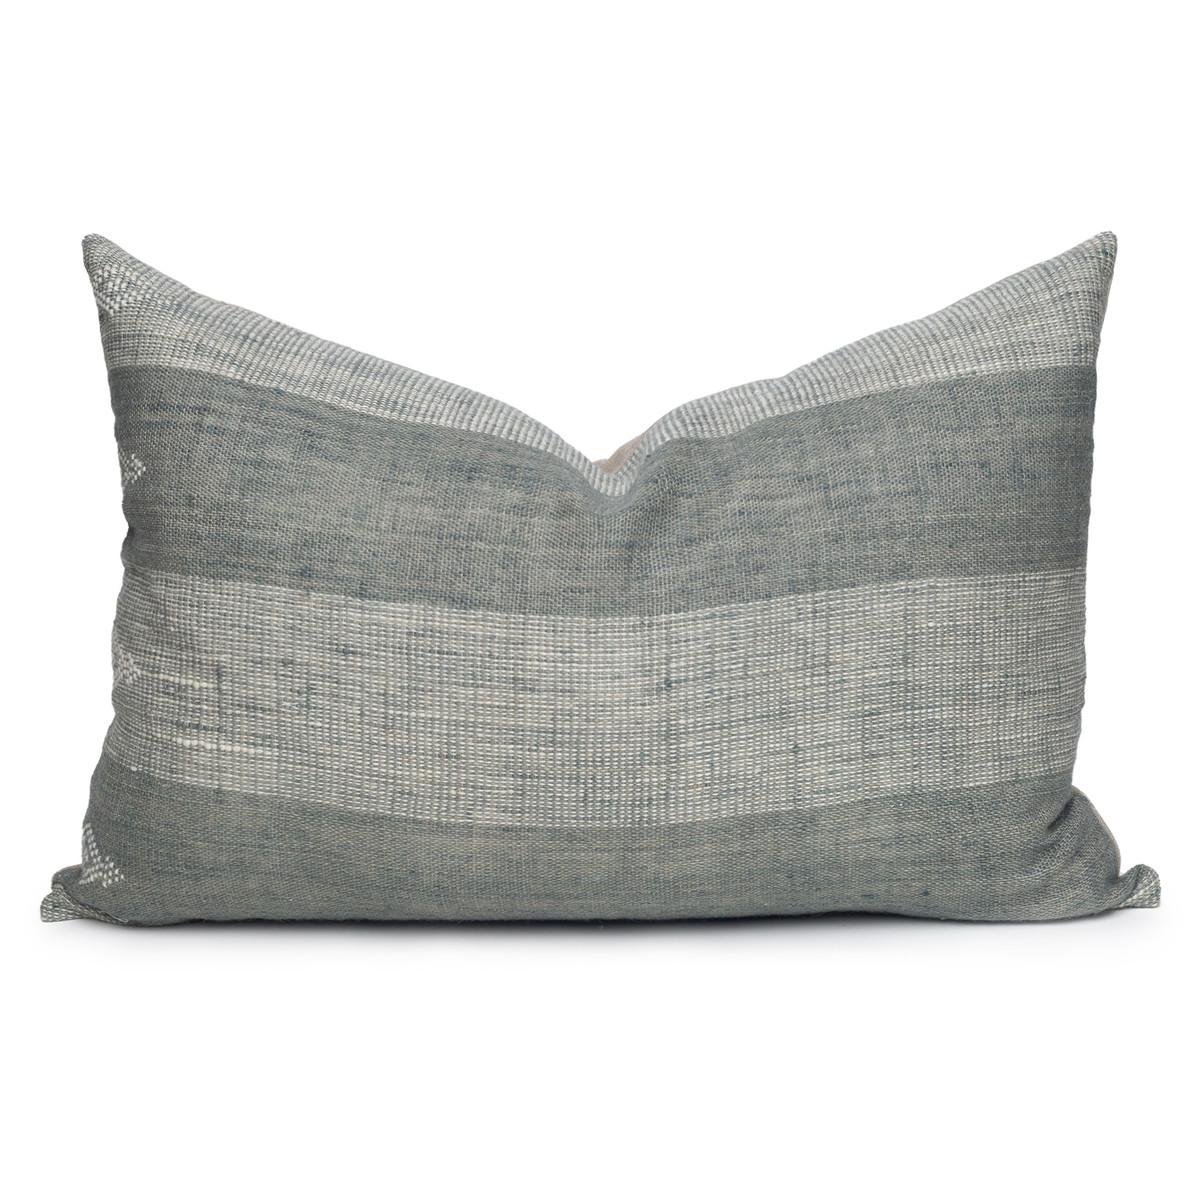 Joey Indian Wool Mint Stripe Lumbar Pillow - 1826- Front View